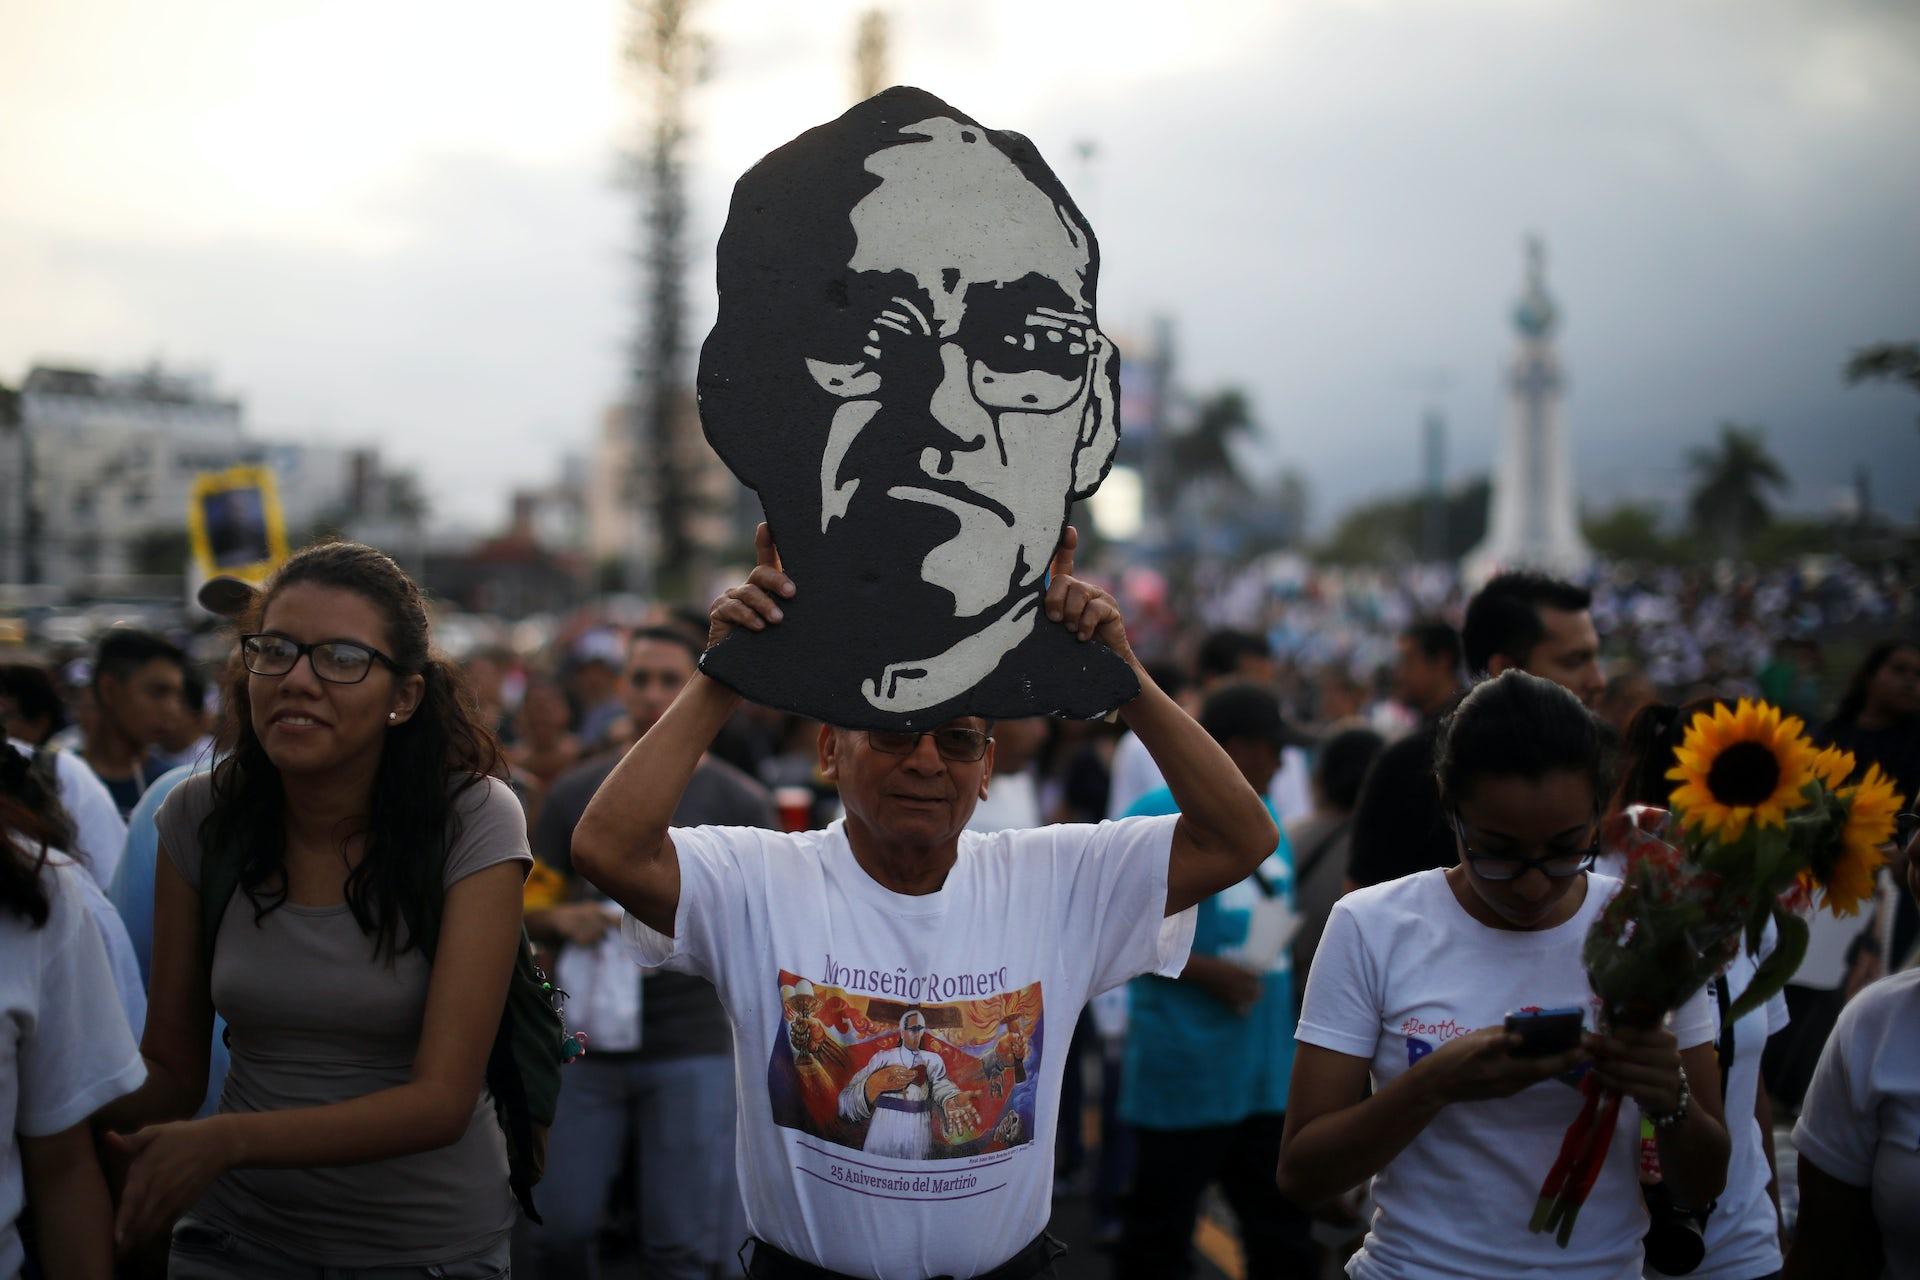 Archbishop Oscar Romero was gunned down inside his own church 38 years ago. Soon he'll become El Salvador's first saint